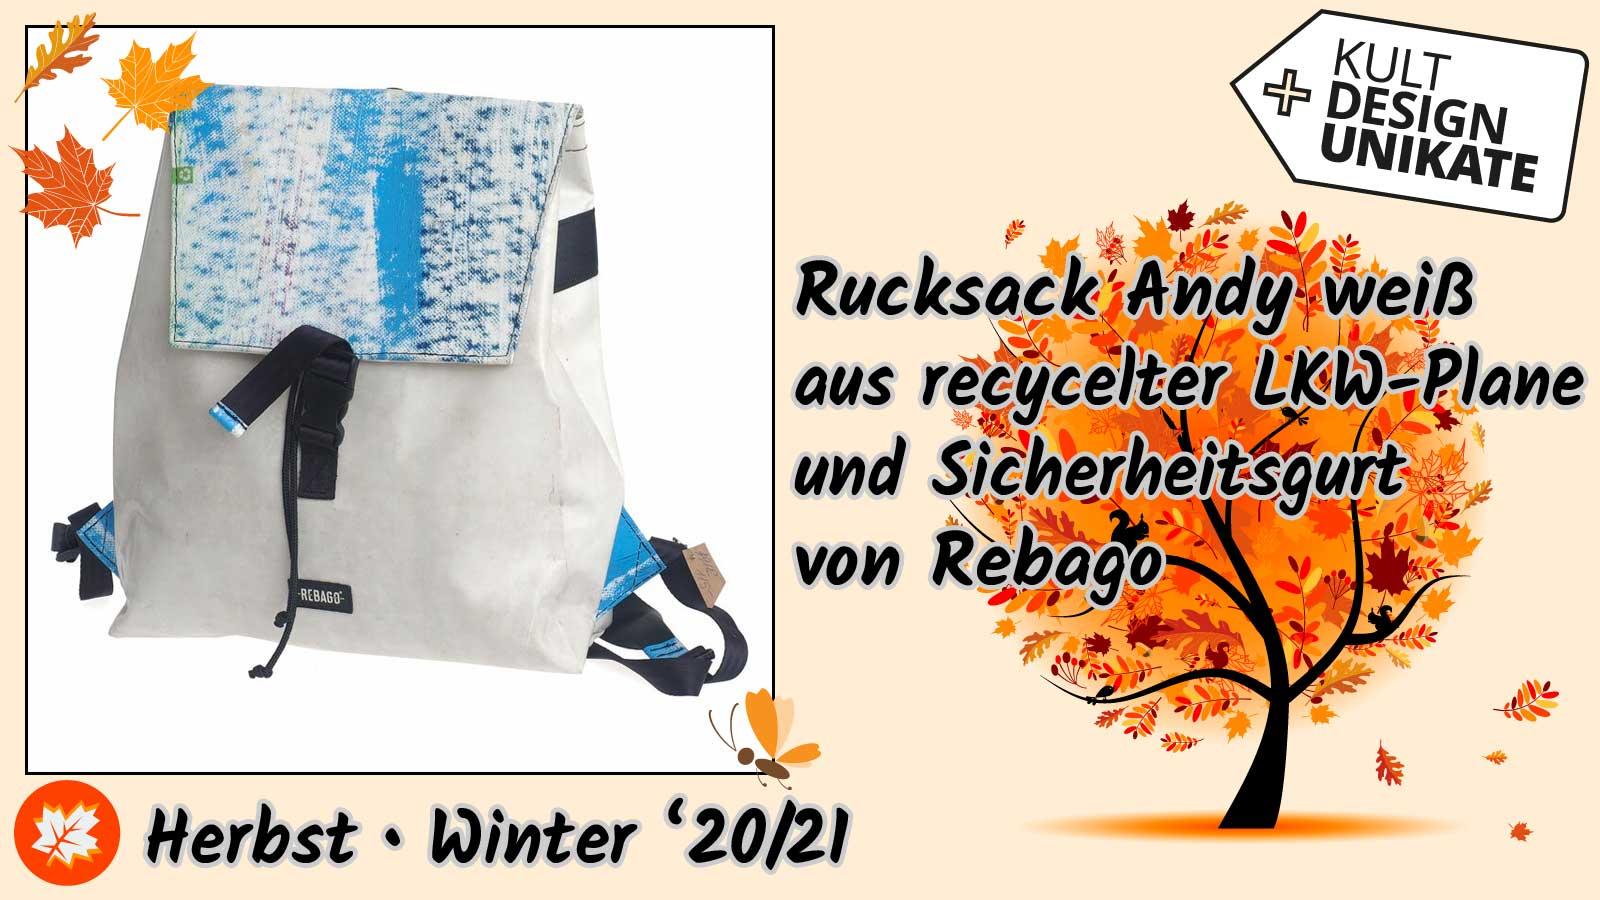 Rebago-Rucksack-Andy-weiss